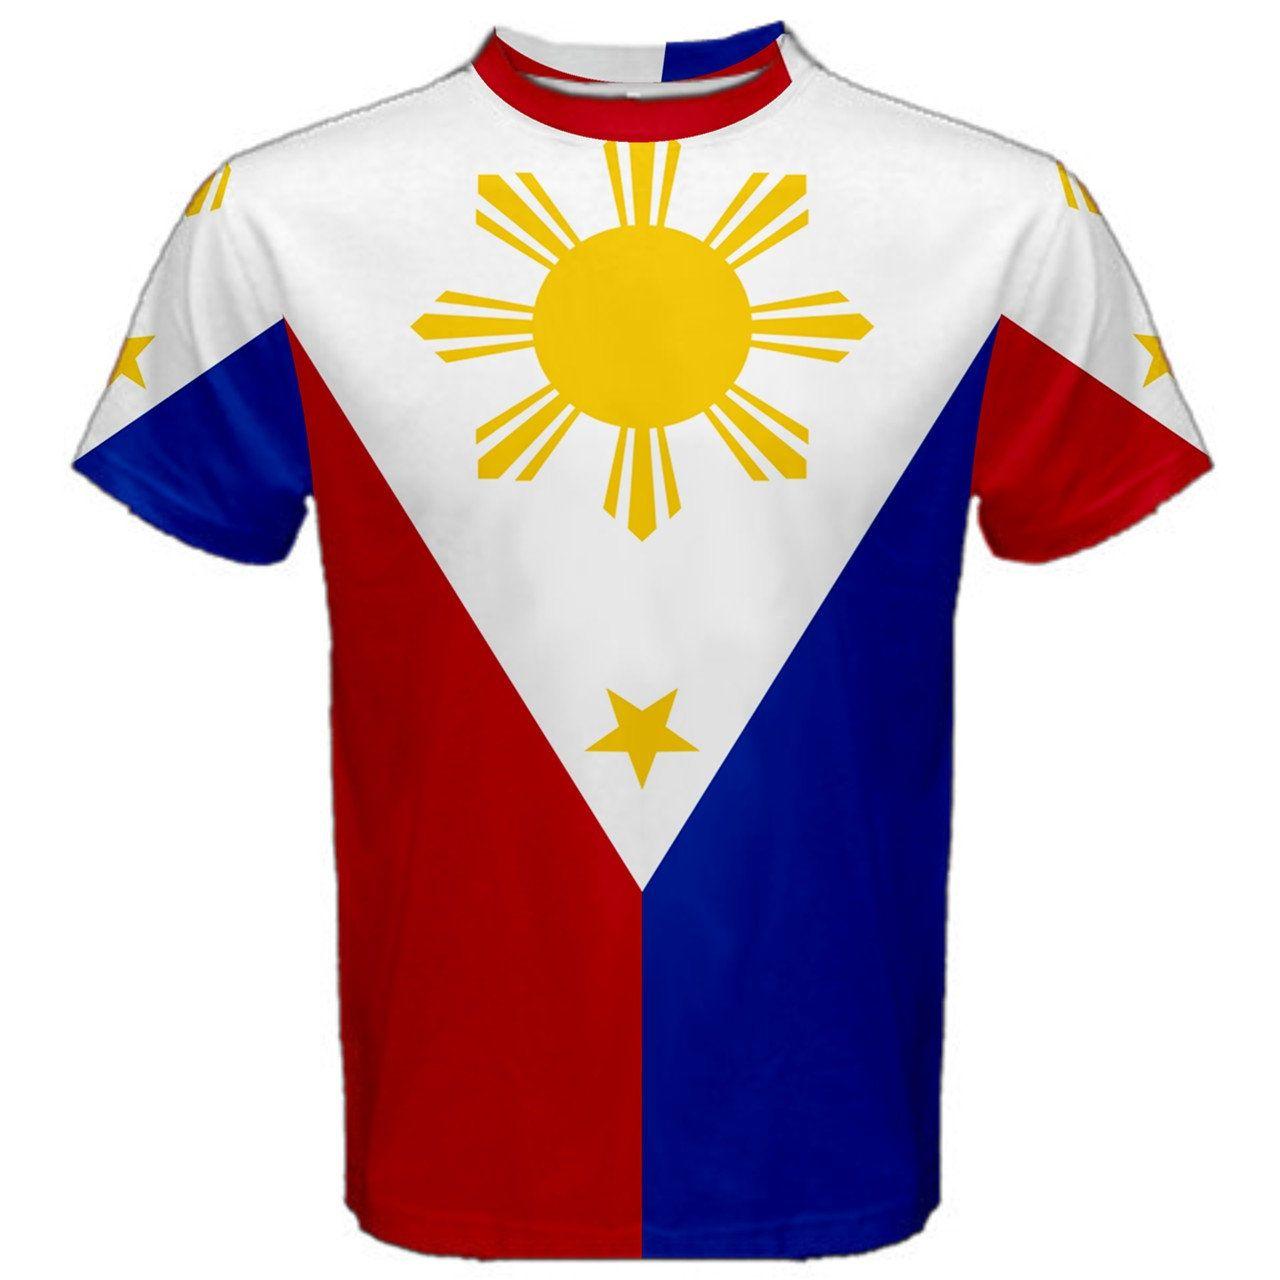 New Philippines Filipino Flag Sublimated Men S Sport Full Etsy Filipino Flag Mesh T Shirt Philippine Flag [ 1280 x 1280 Pixel ]